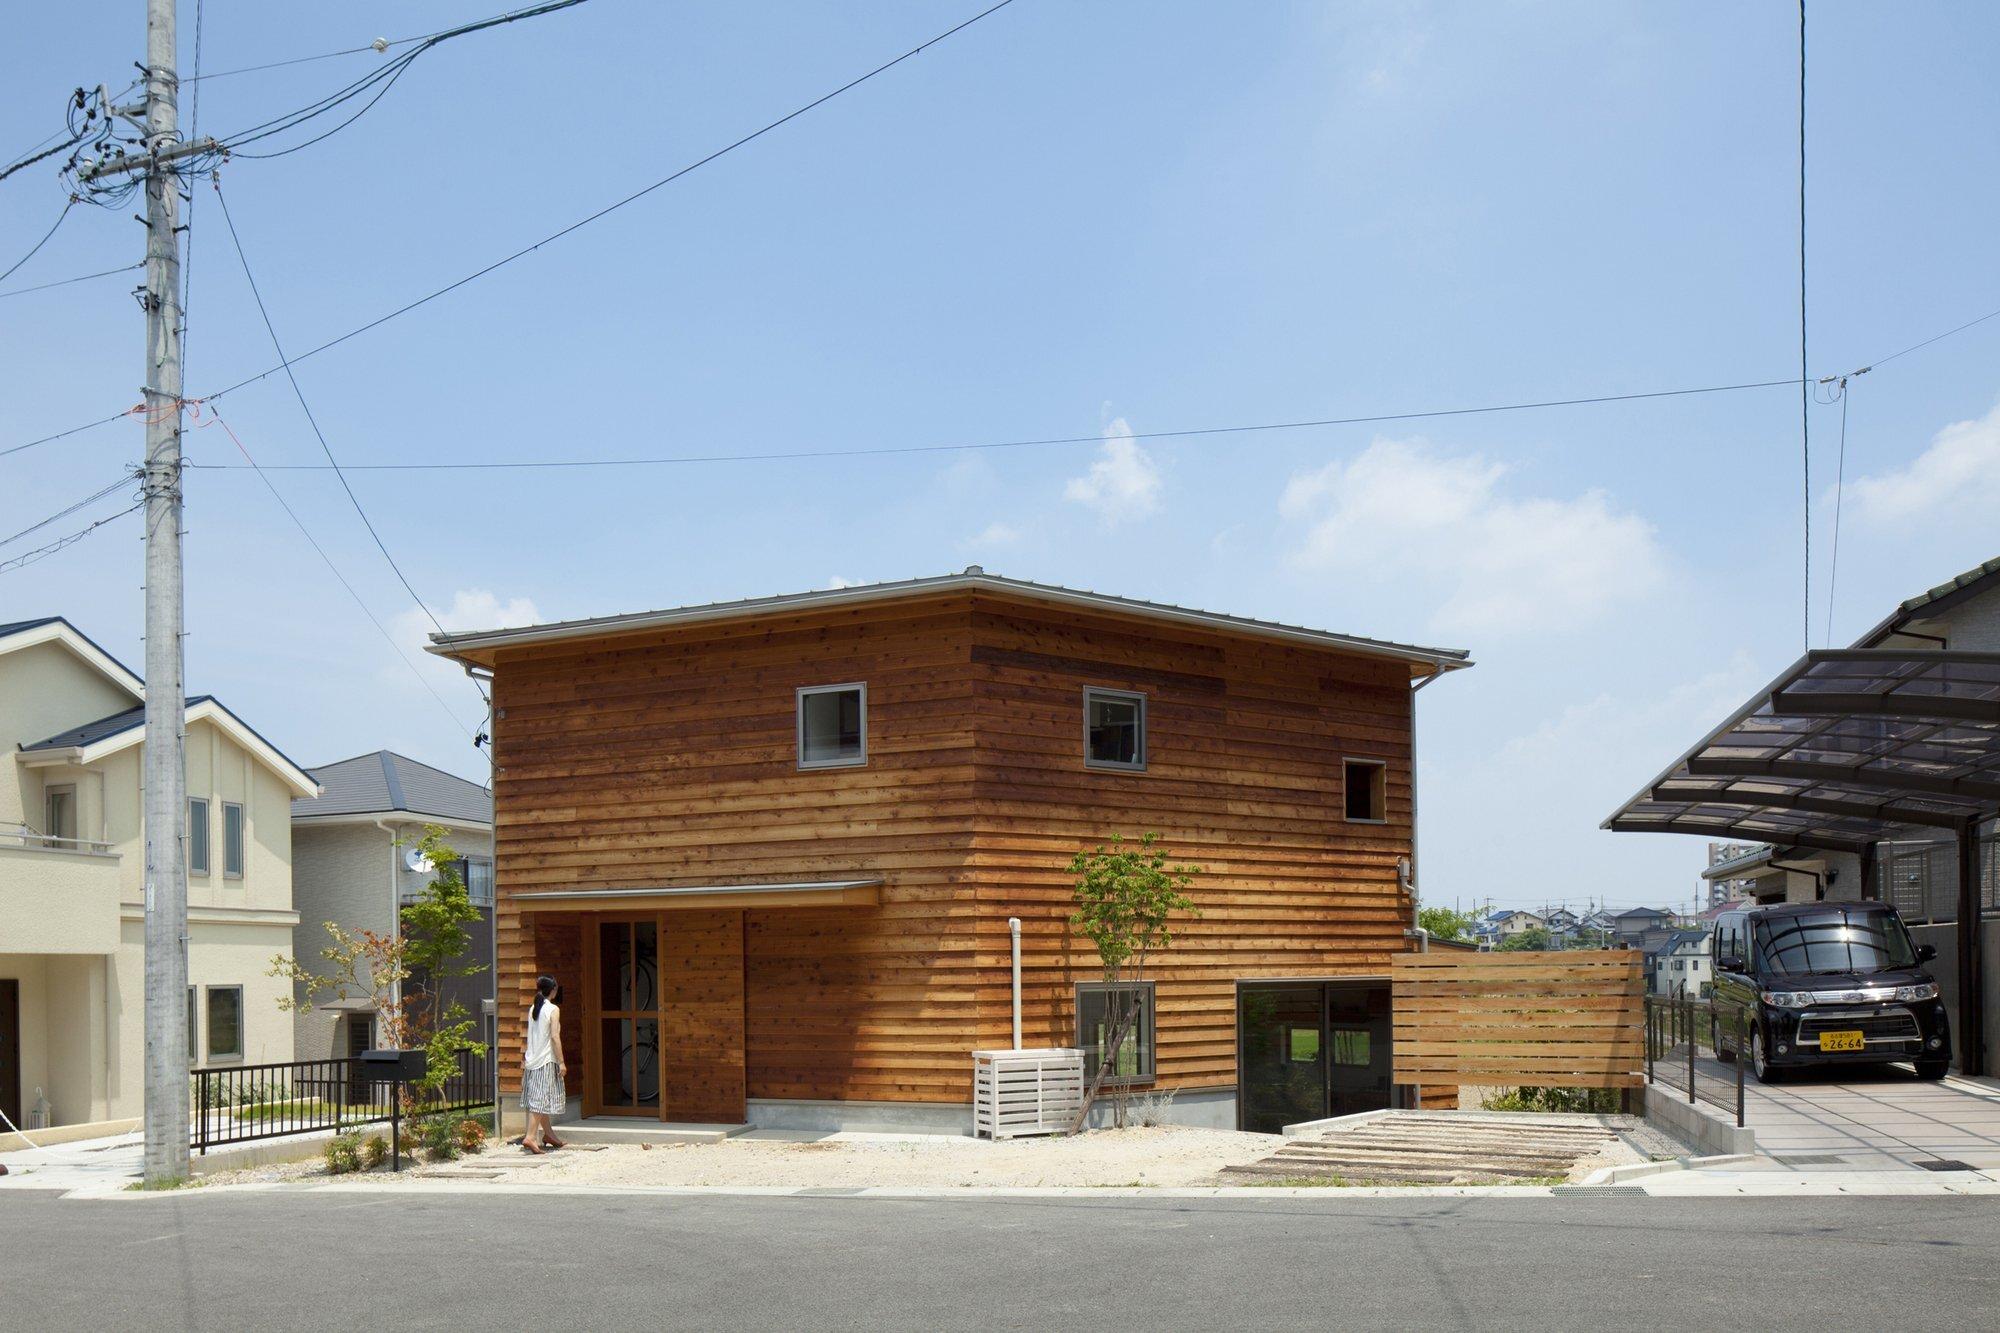 The Frontier House - Small Japanese House - Mamiya Shinichi Design Studio - Toyoake Japan - Exterior - Humble Homes